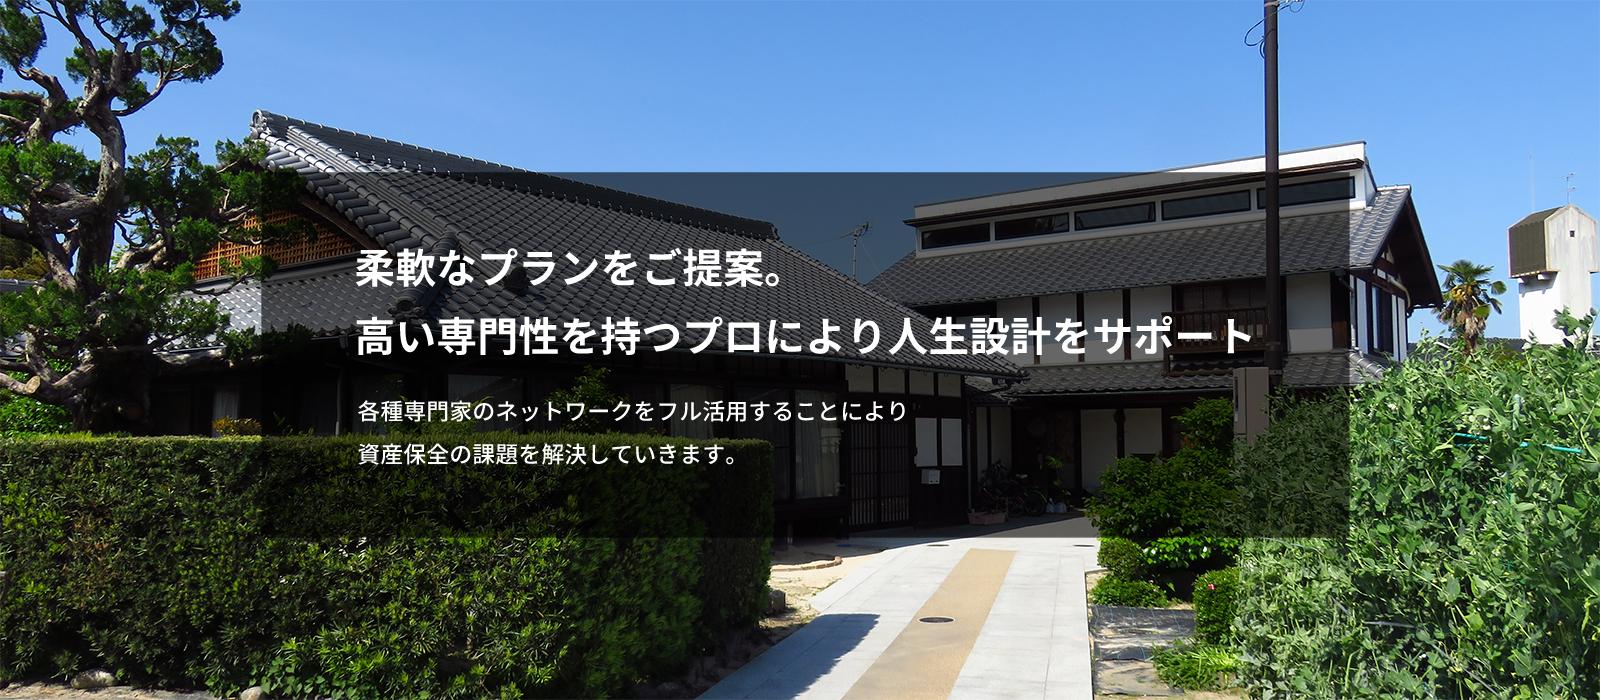 岡山の不動産・資産形成の無料相談窓口